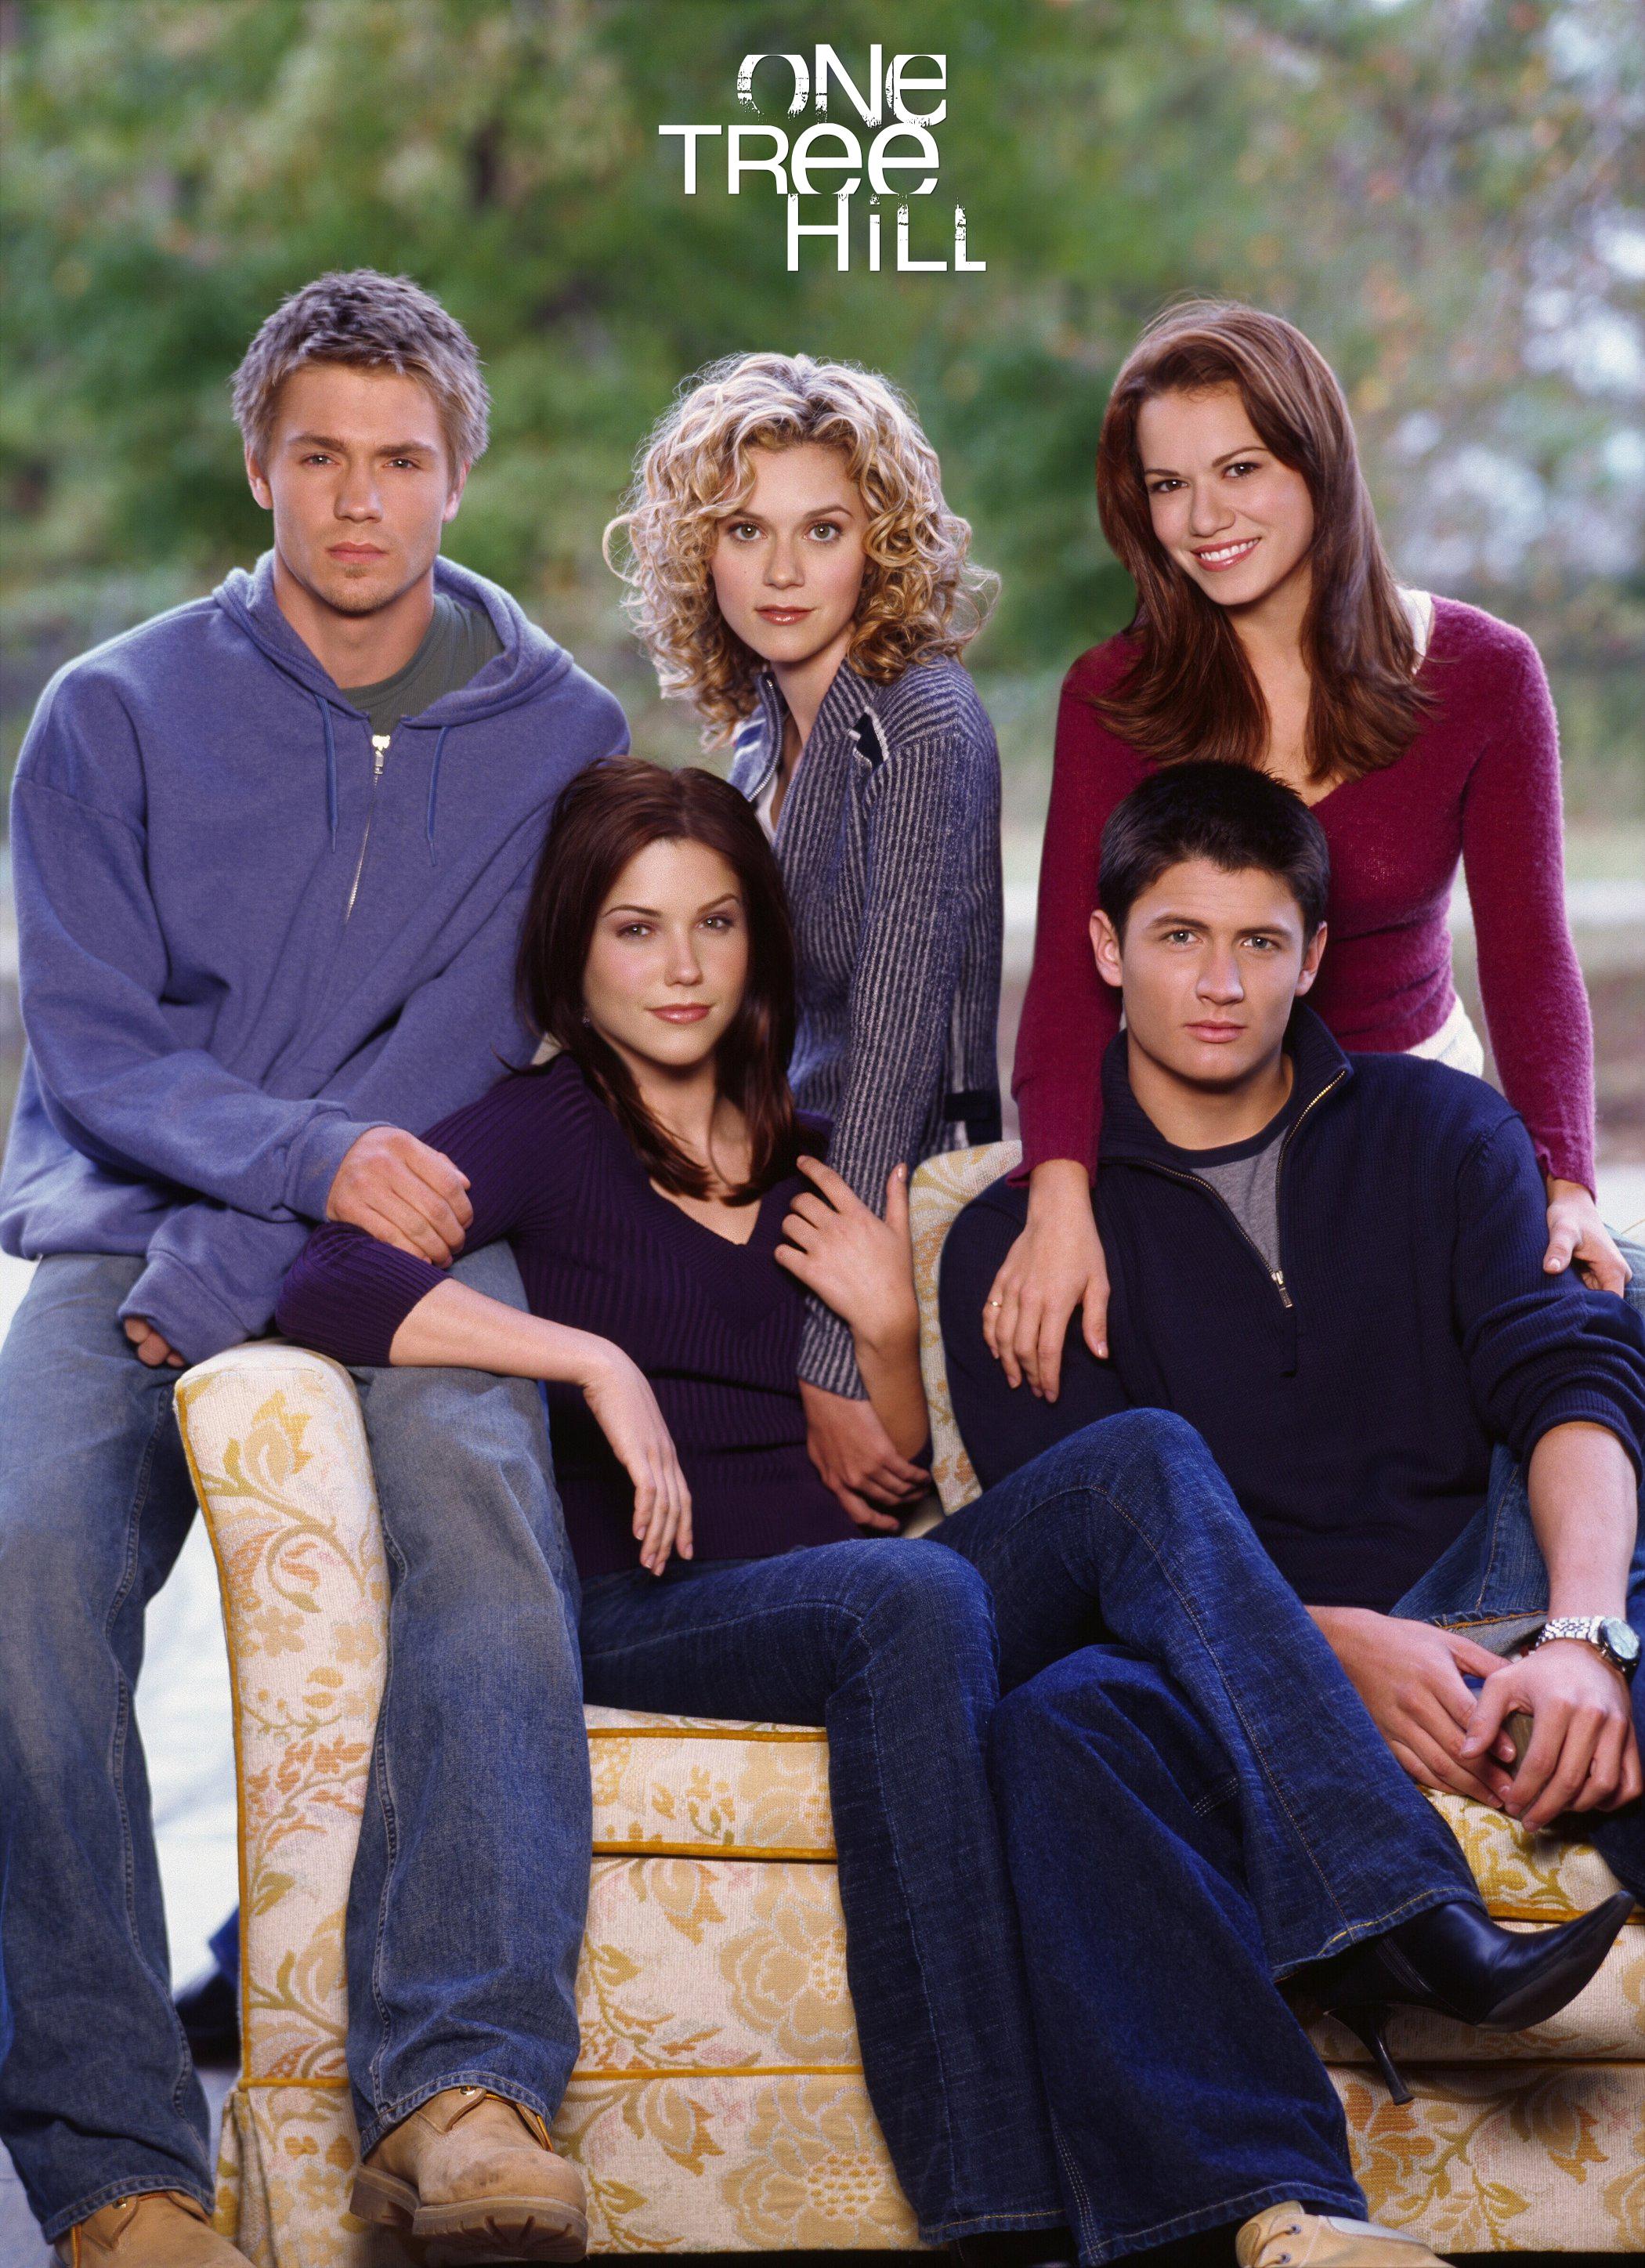 Sophia Bush, James Lafferty, Bethany Joy Lenz, Chad Michael Murray, and Hilarie Burton in One Tree Hill (2003)